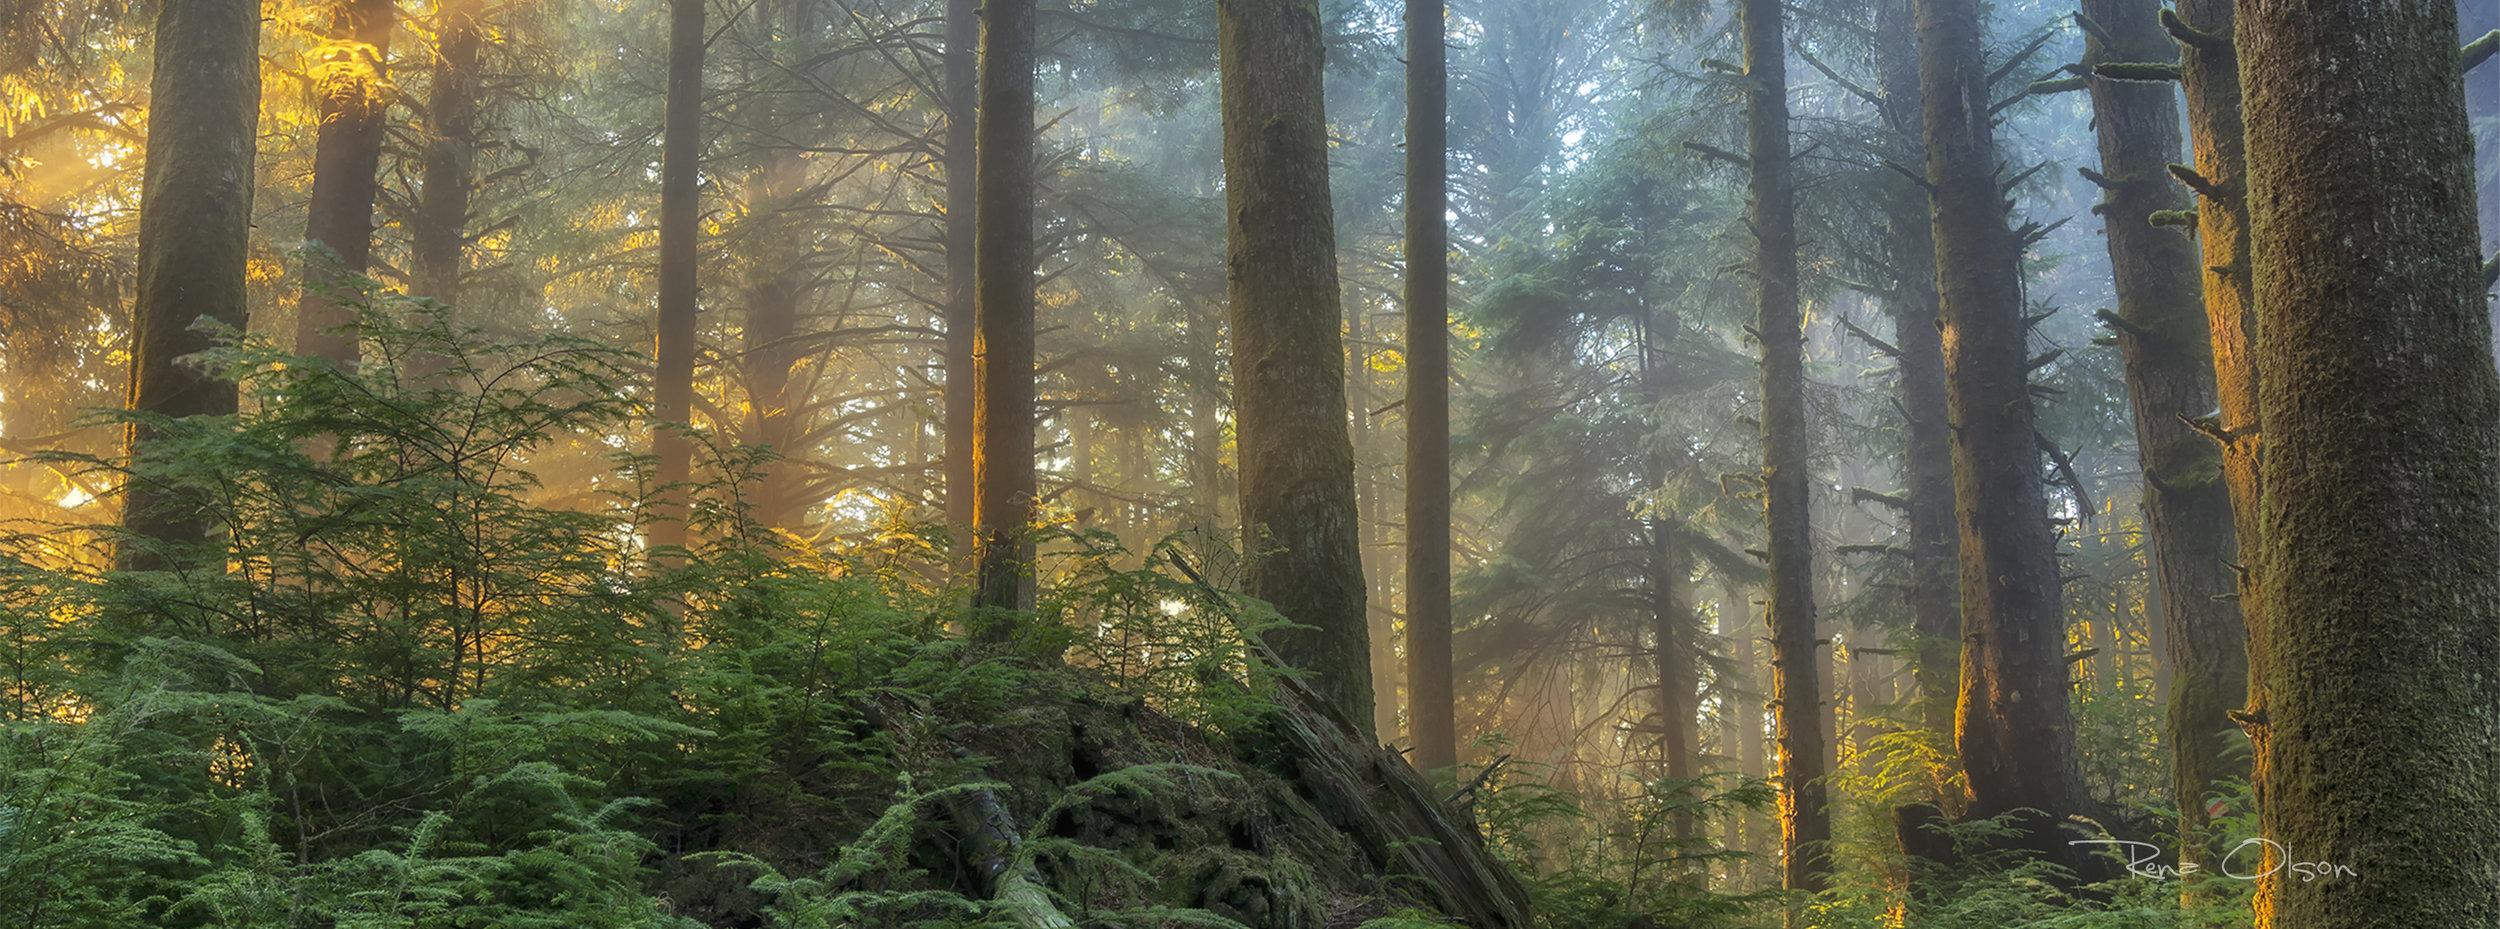 IMG_2384-yakona-forest-lighta SS.jpg